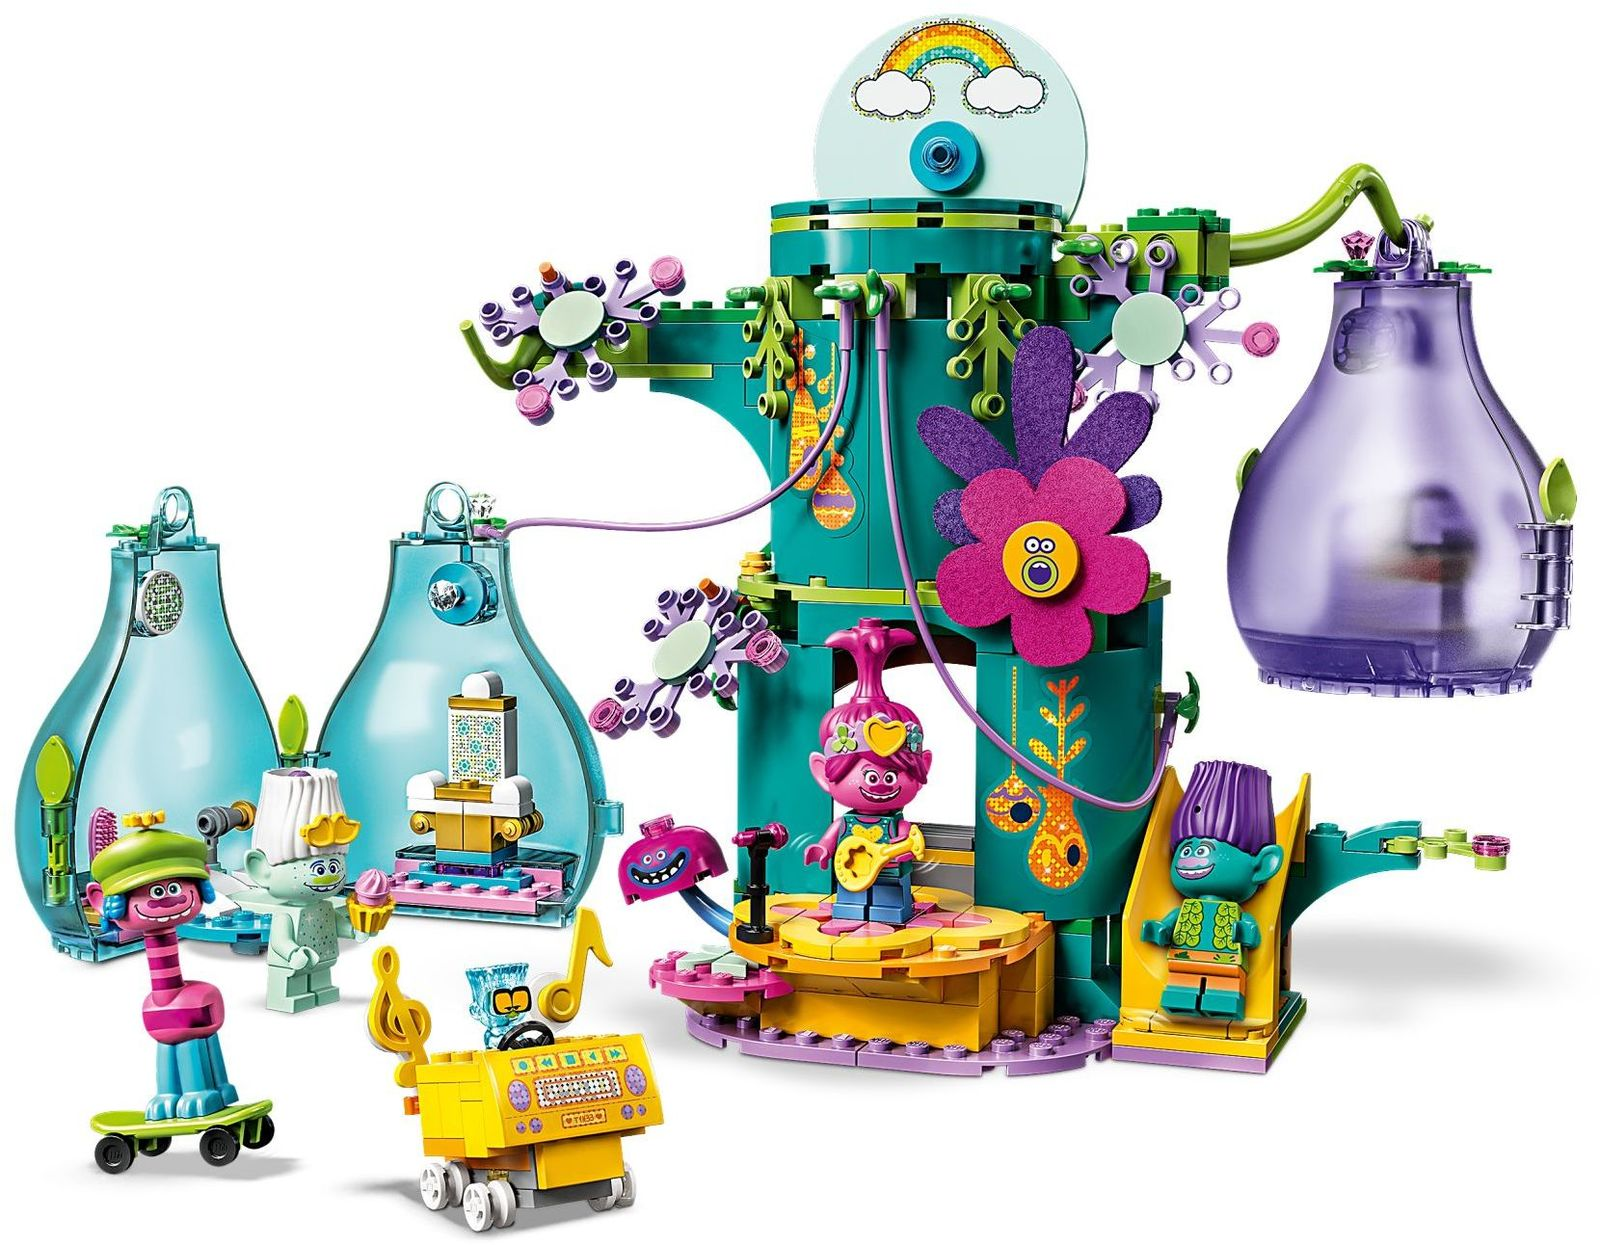 LEGO Trolls: Pop Village Celebration - (41255) image